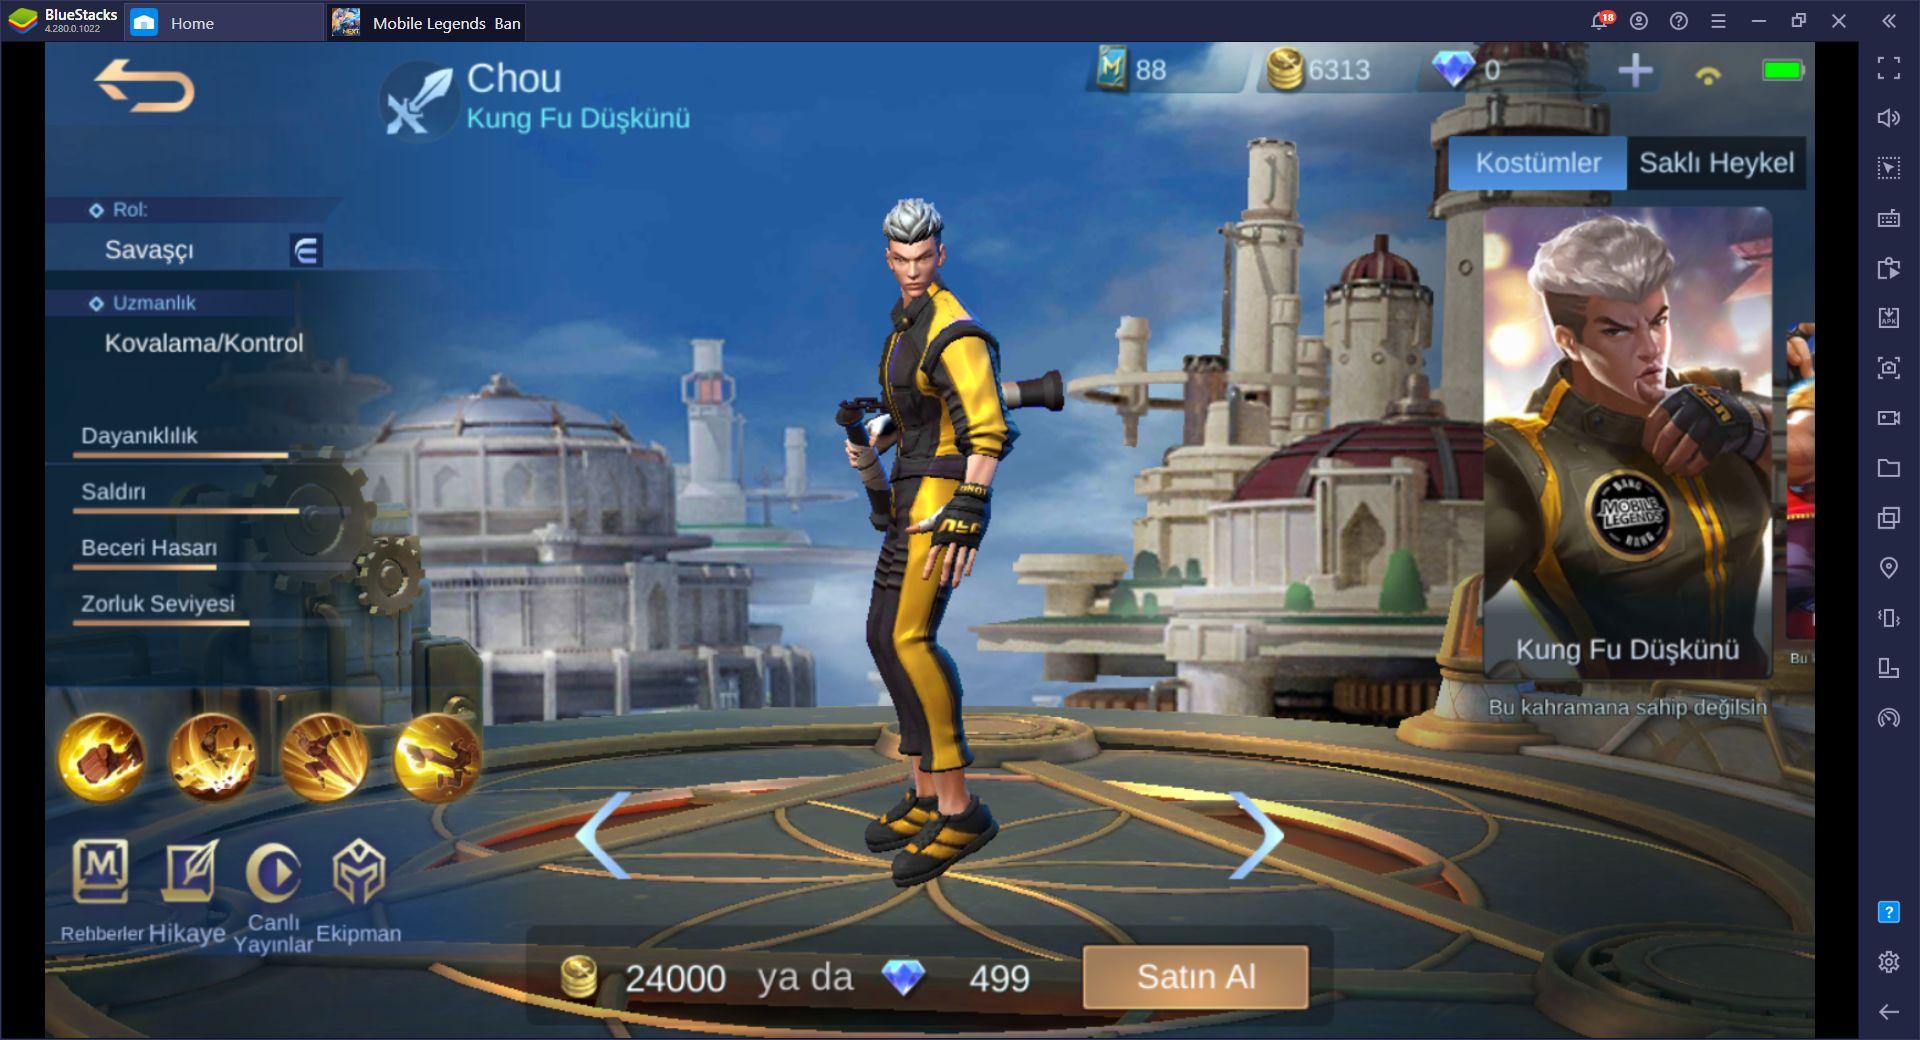 Mobile Legends Bang Bang Üst Koridor Taktikleri